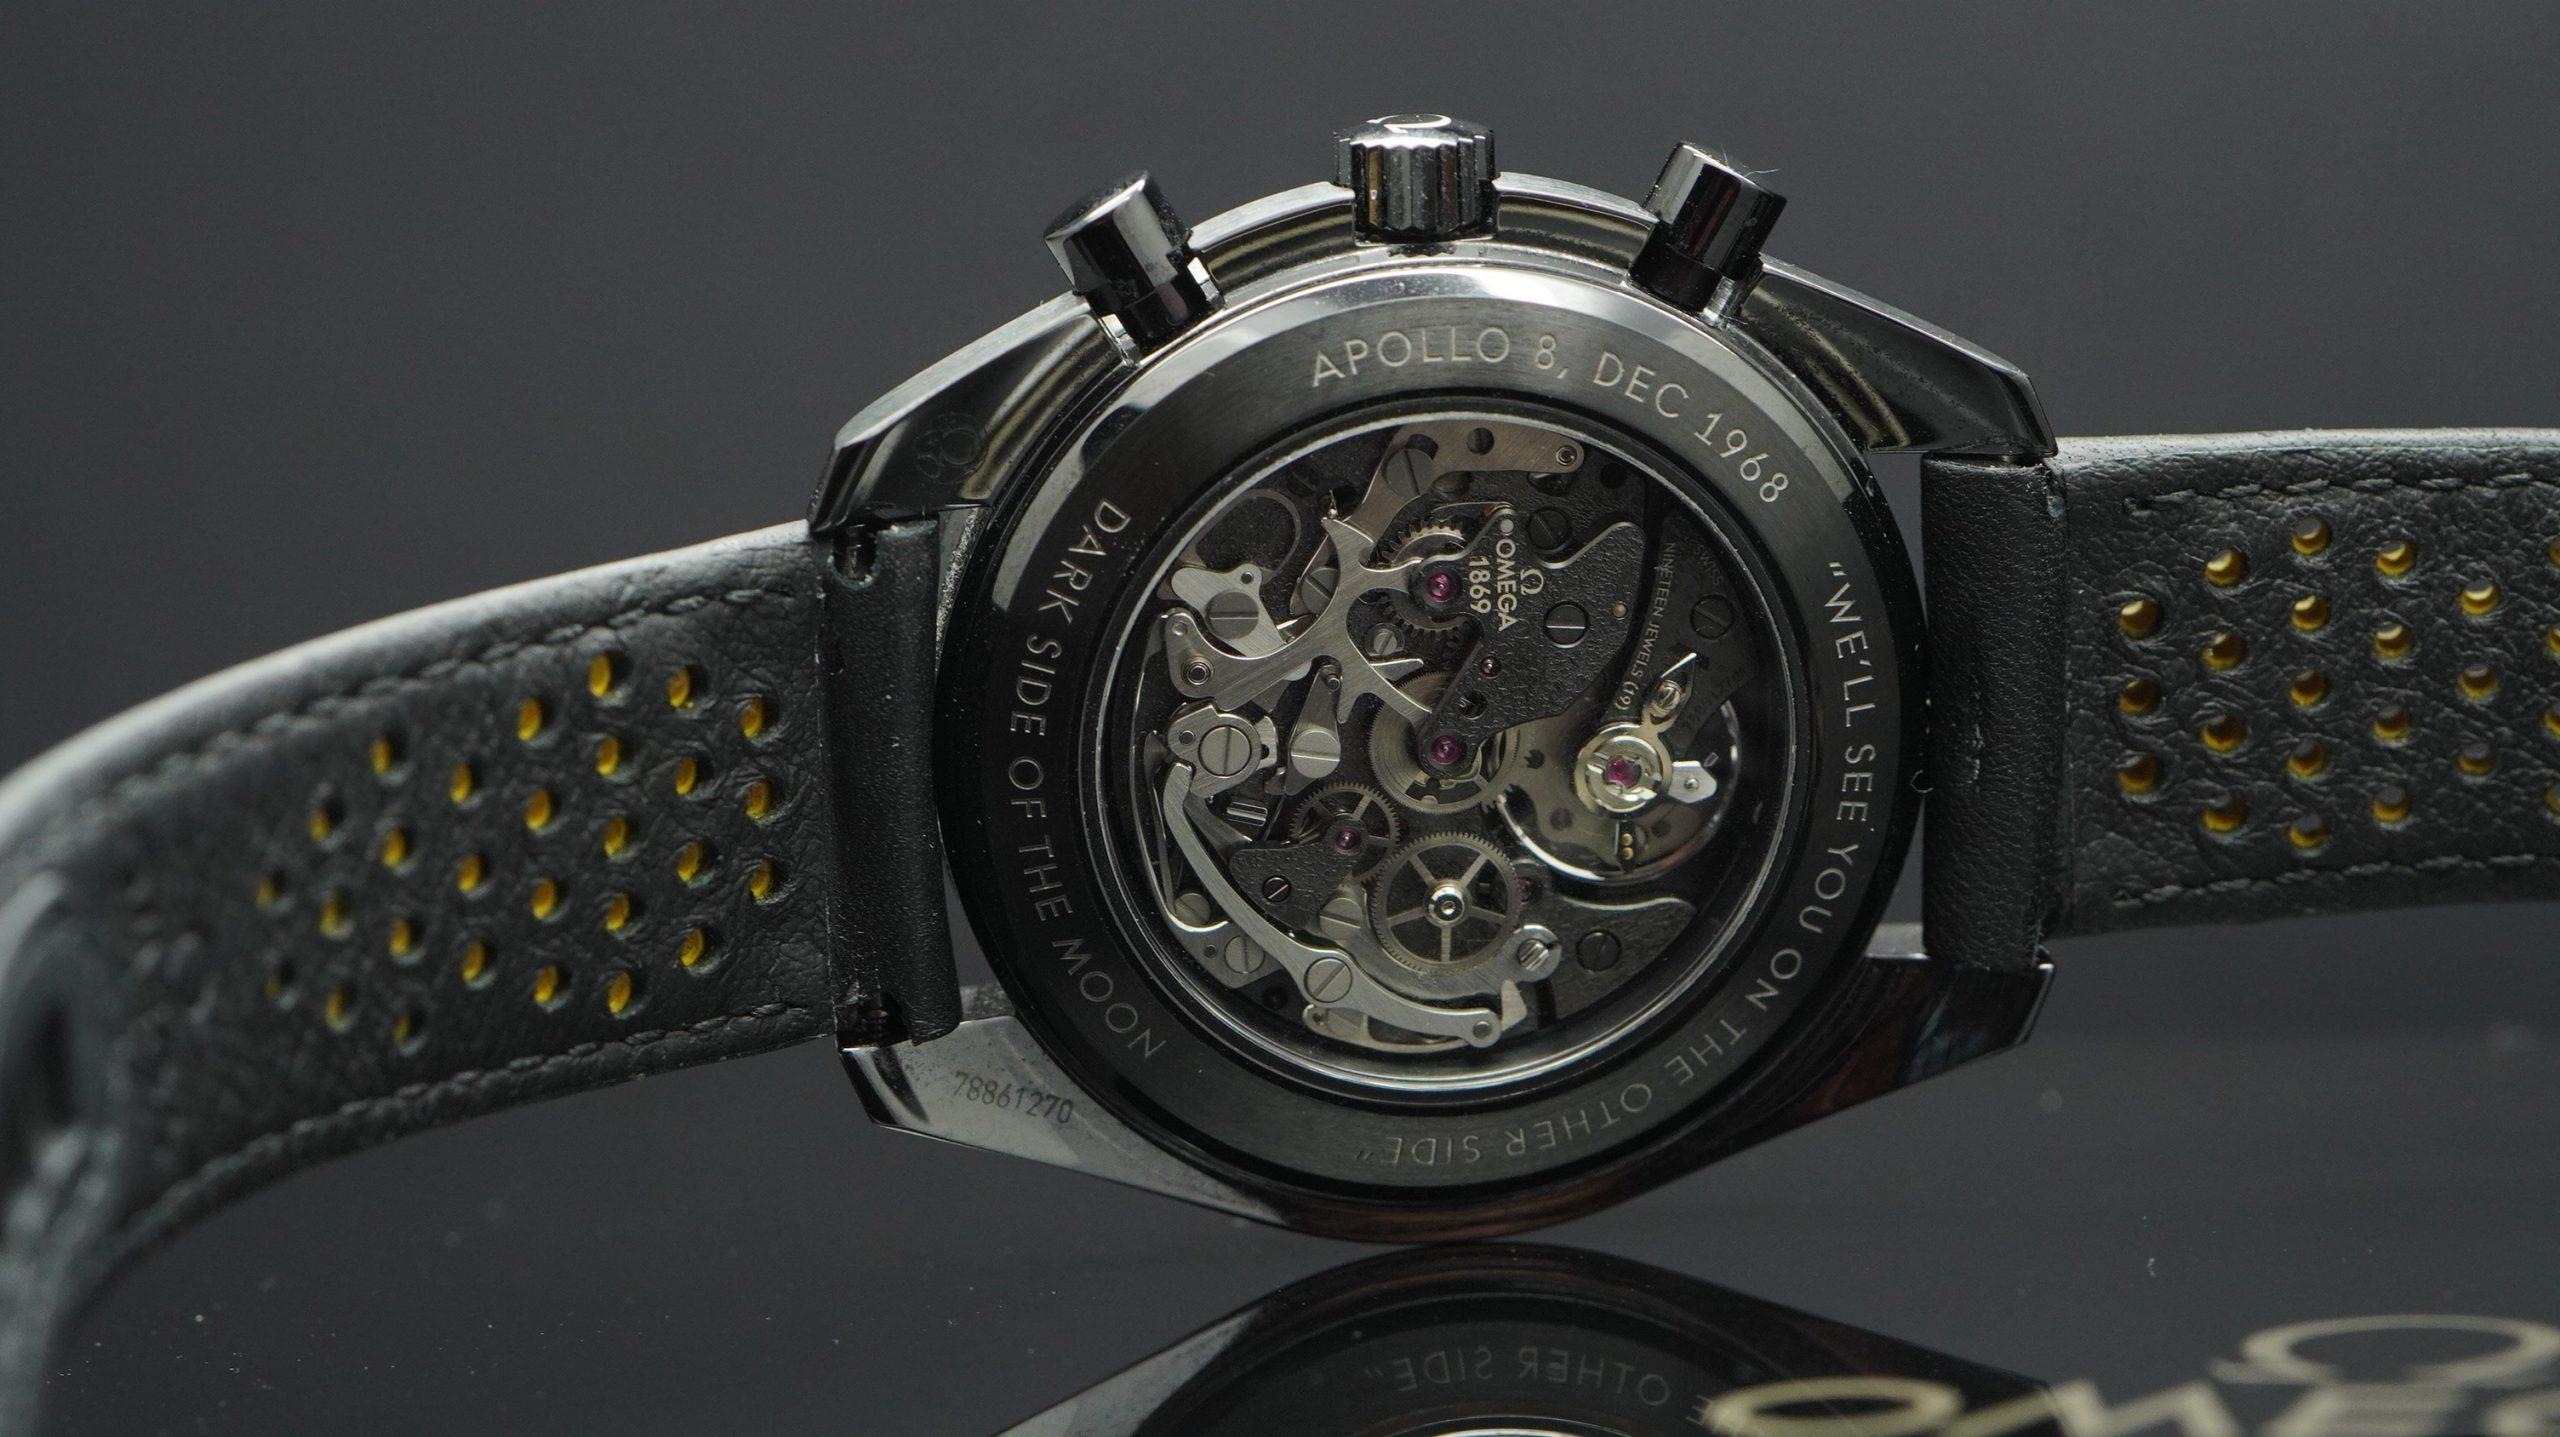 Omega Apollo 8